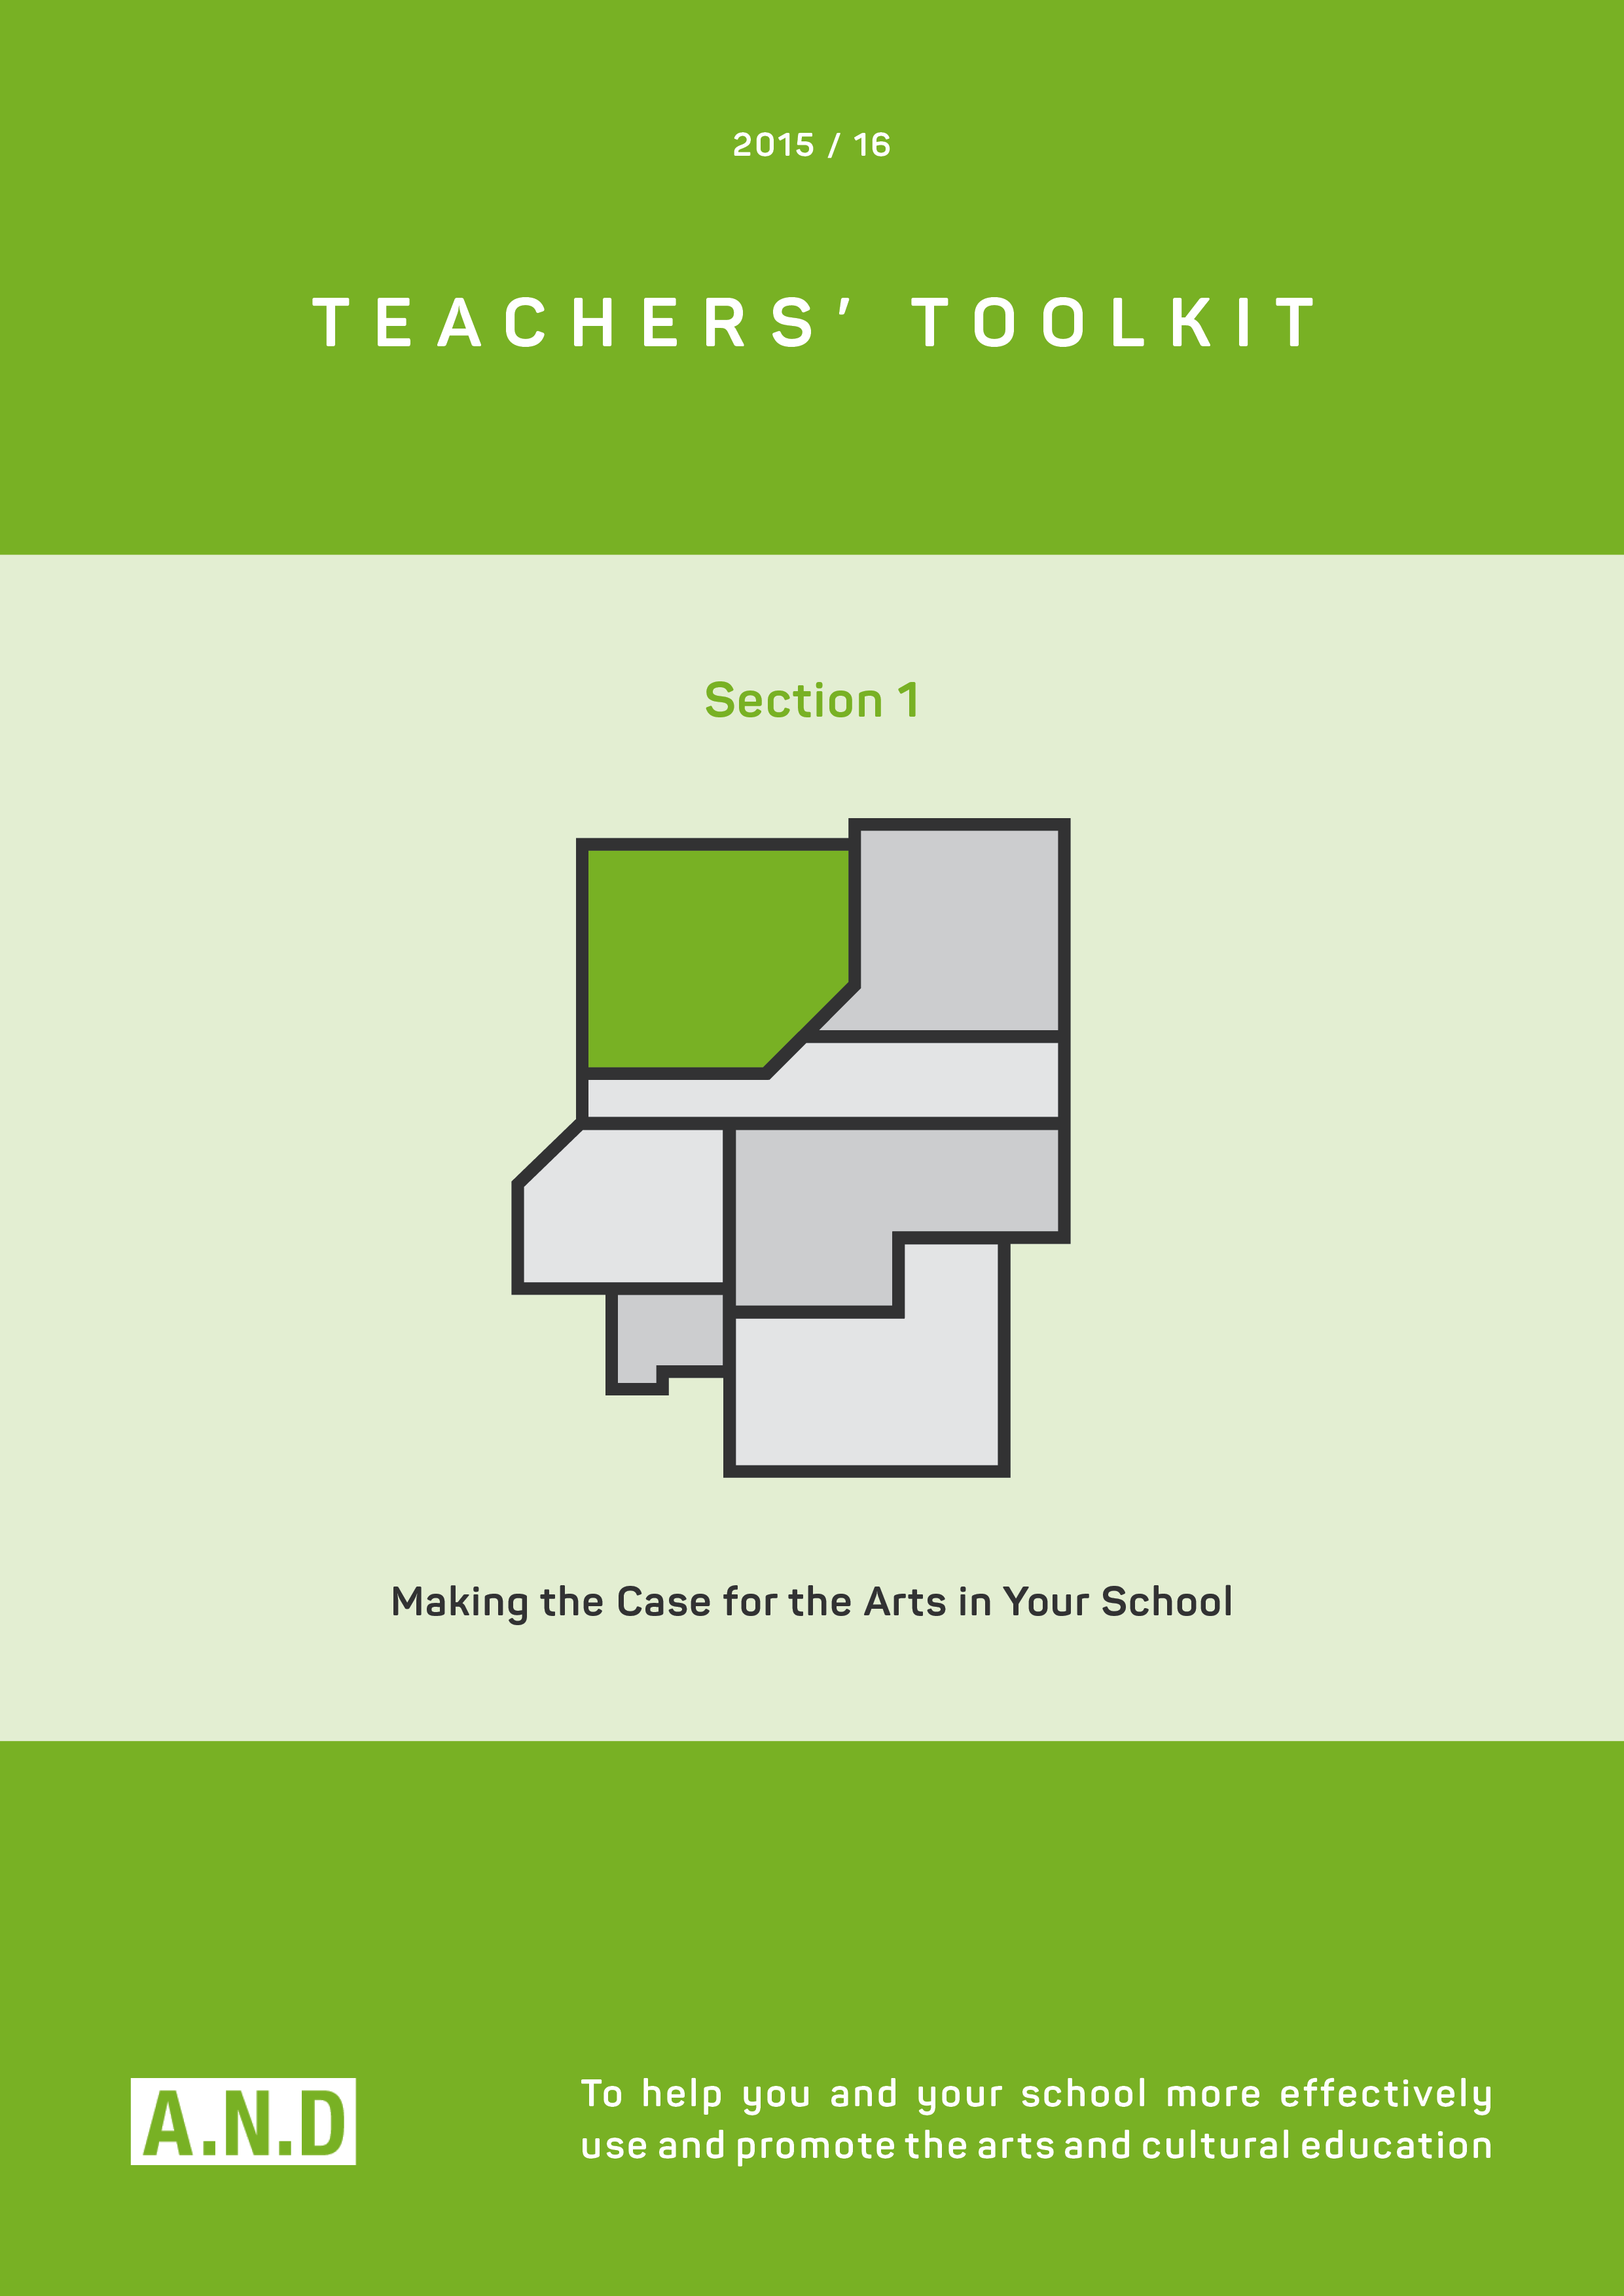 Teachers toolkit(121015)_7.png